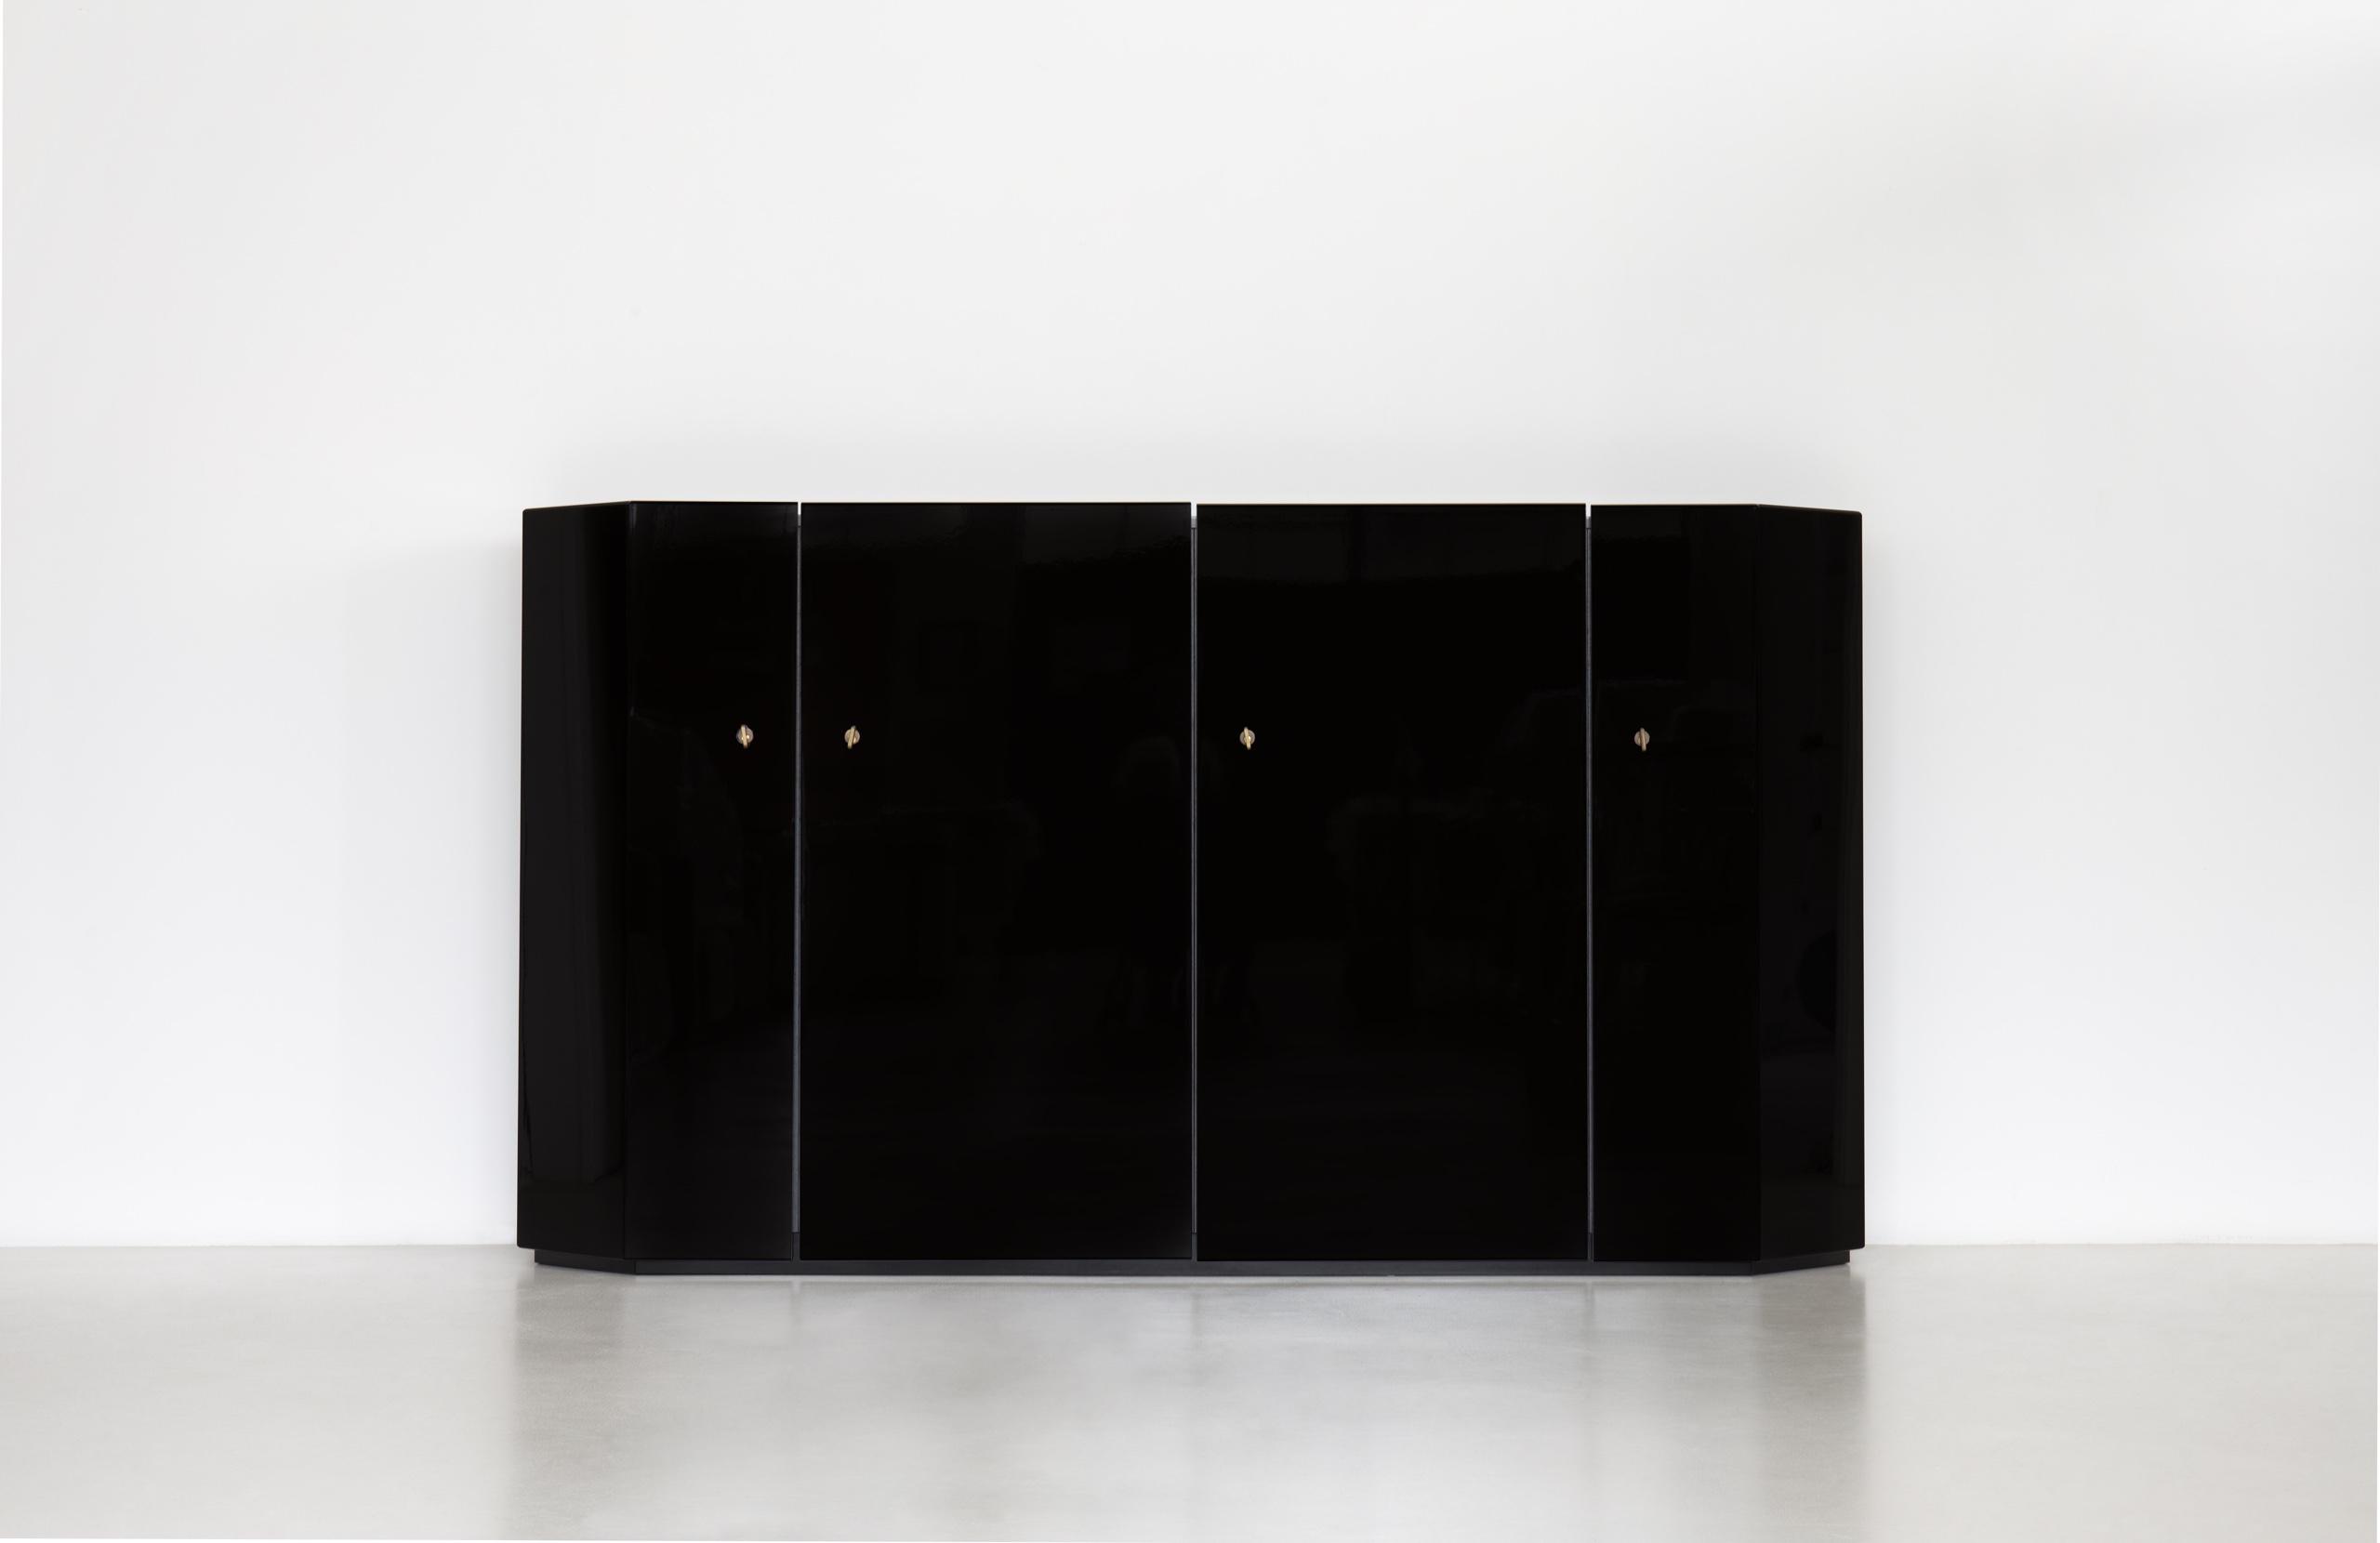 Bramante 4 sideboard by Kazuhide Takahama | Paradisoterrestre